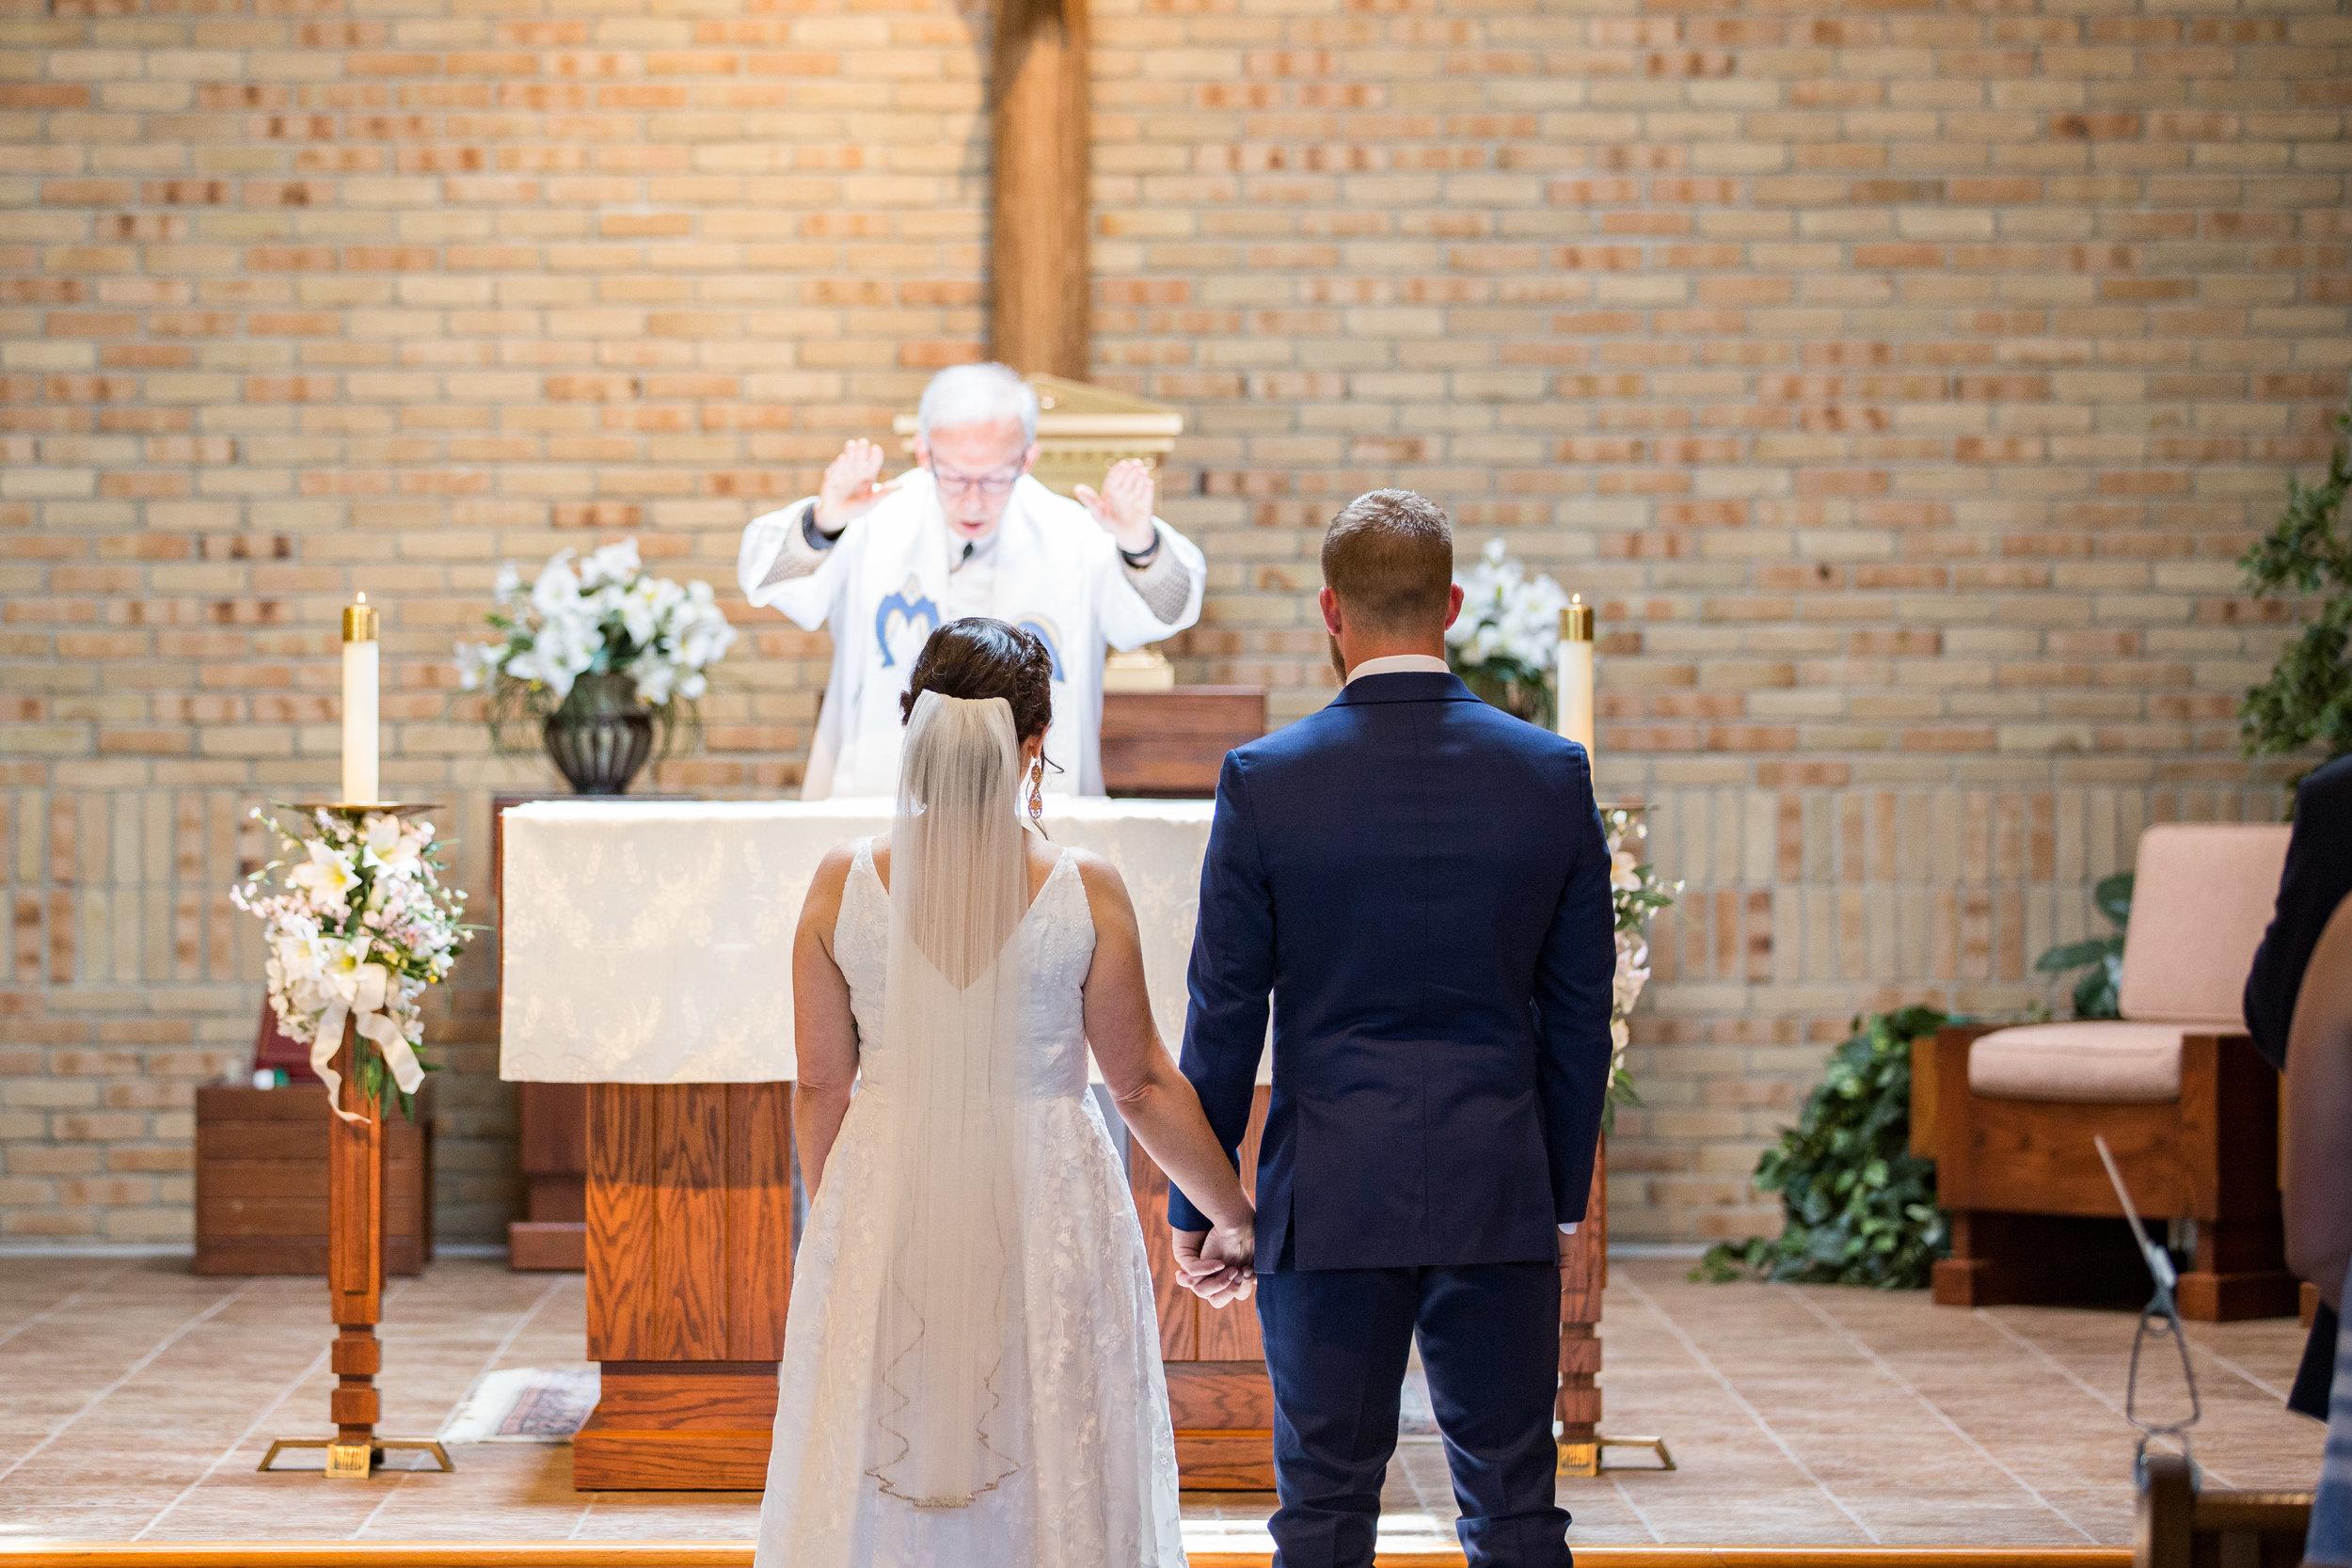 Natalie and Dallas Mooney Wedding 6-8-19_Tania Watt Photography-136.jpg